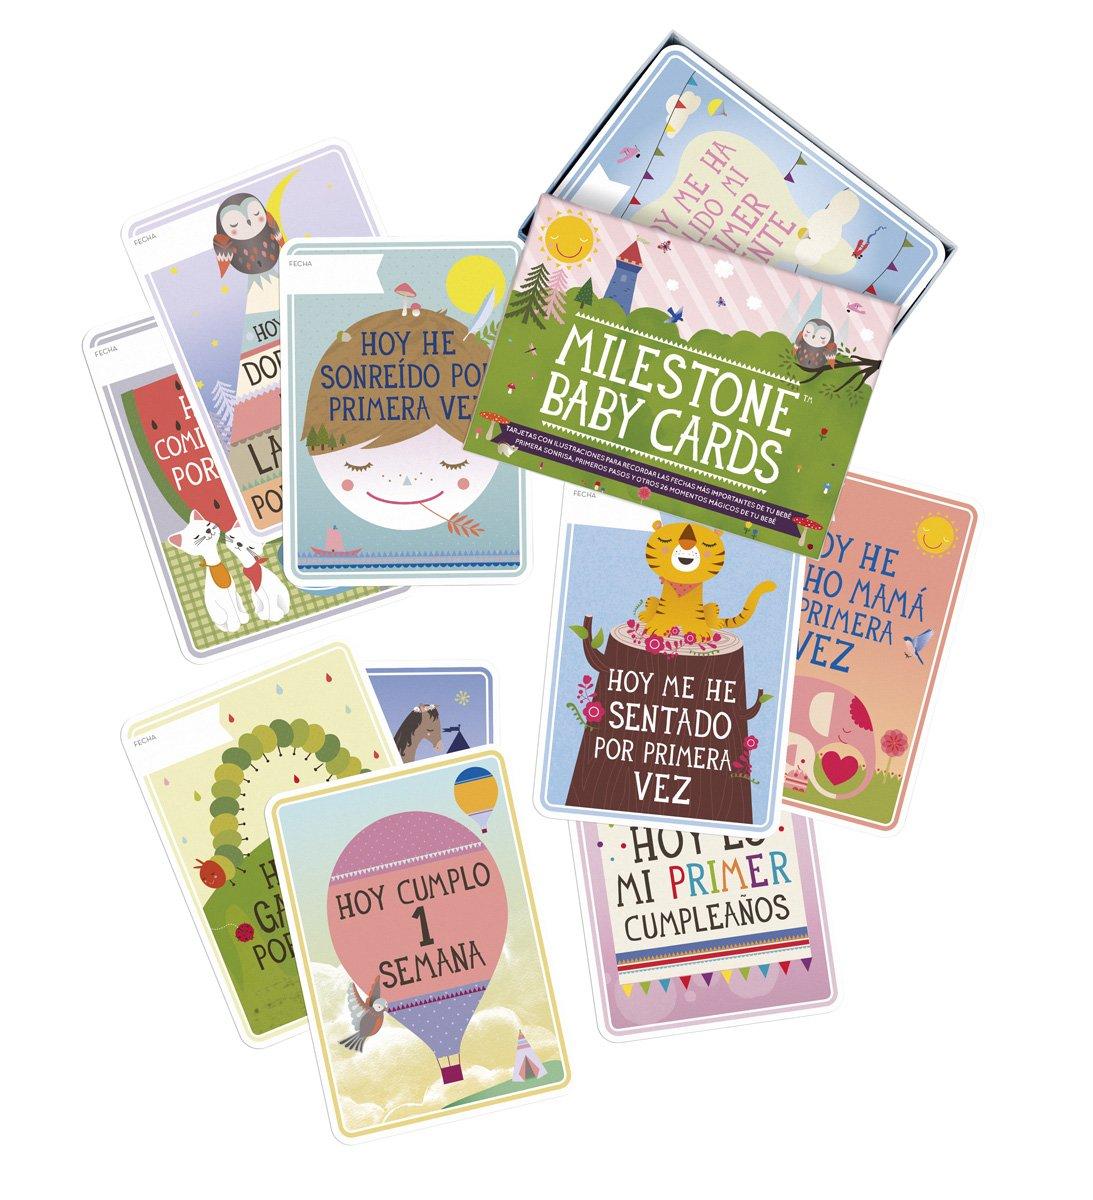 MILLESTONE BABY CARDS Tarjetas Momentos Inolvidables (español) MILESTONE